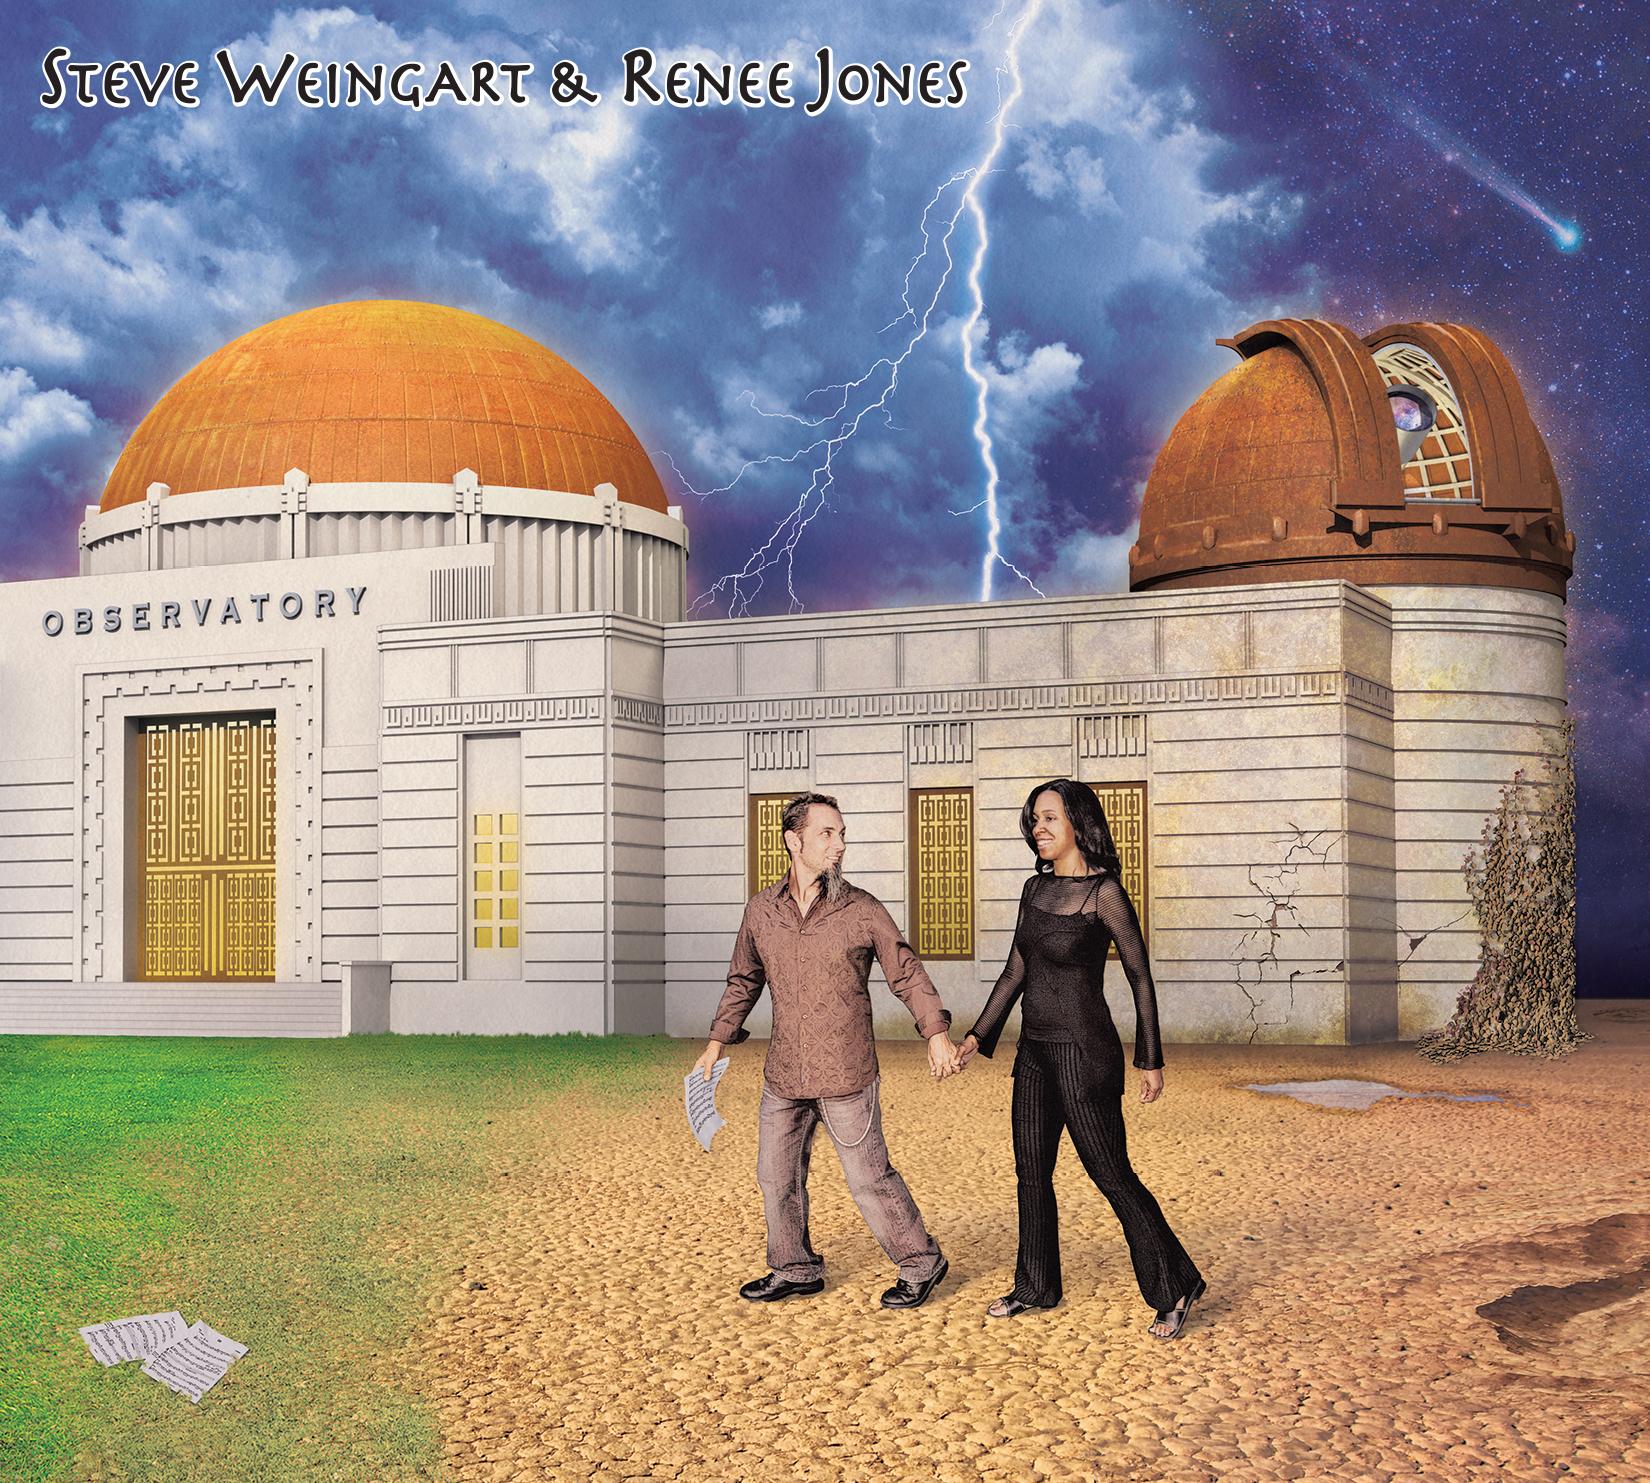 Steve Weingart & Renee Jones - 'Observatory'